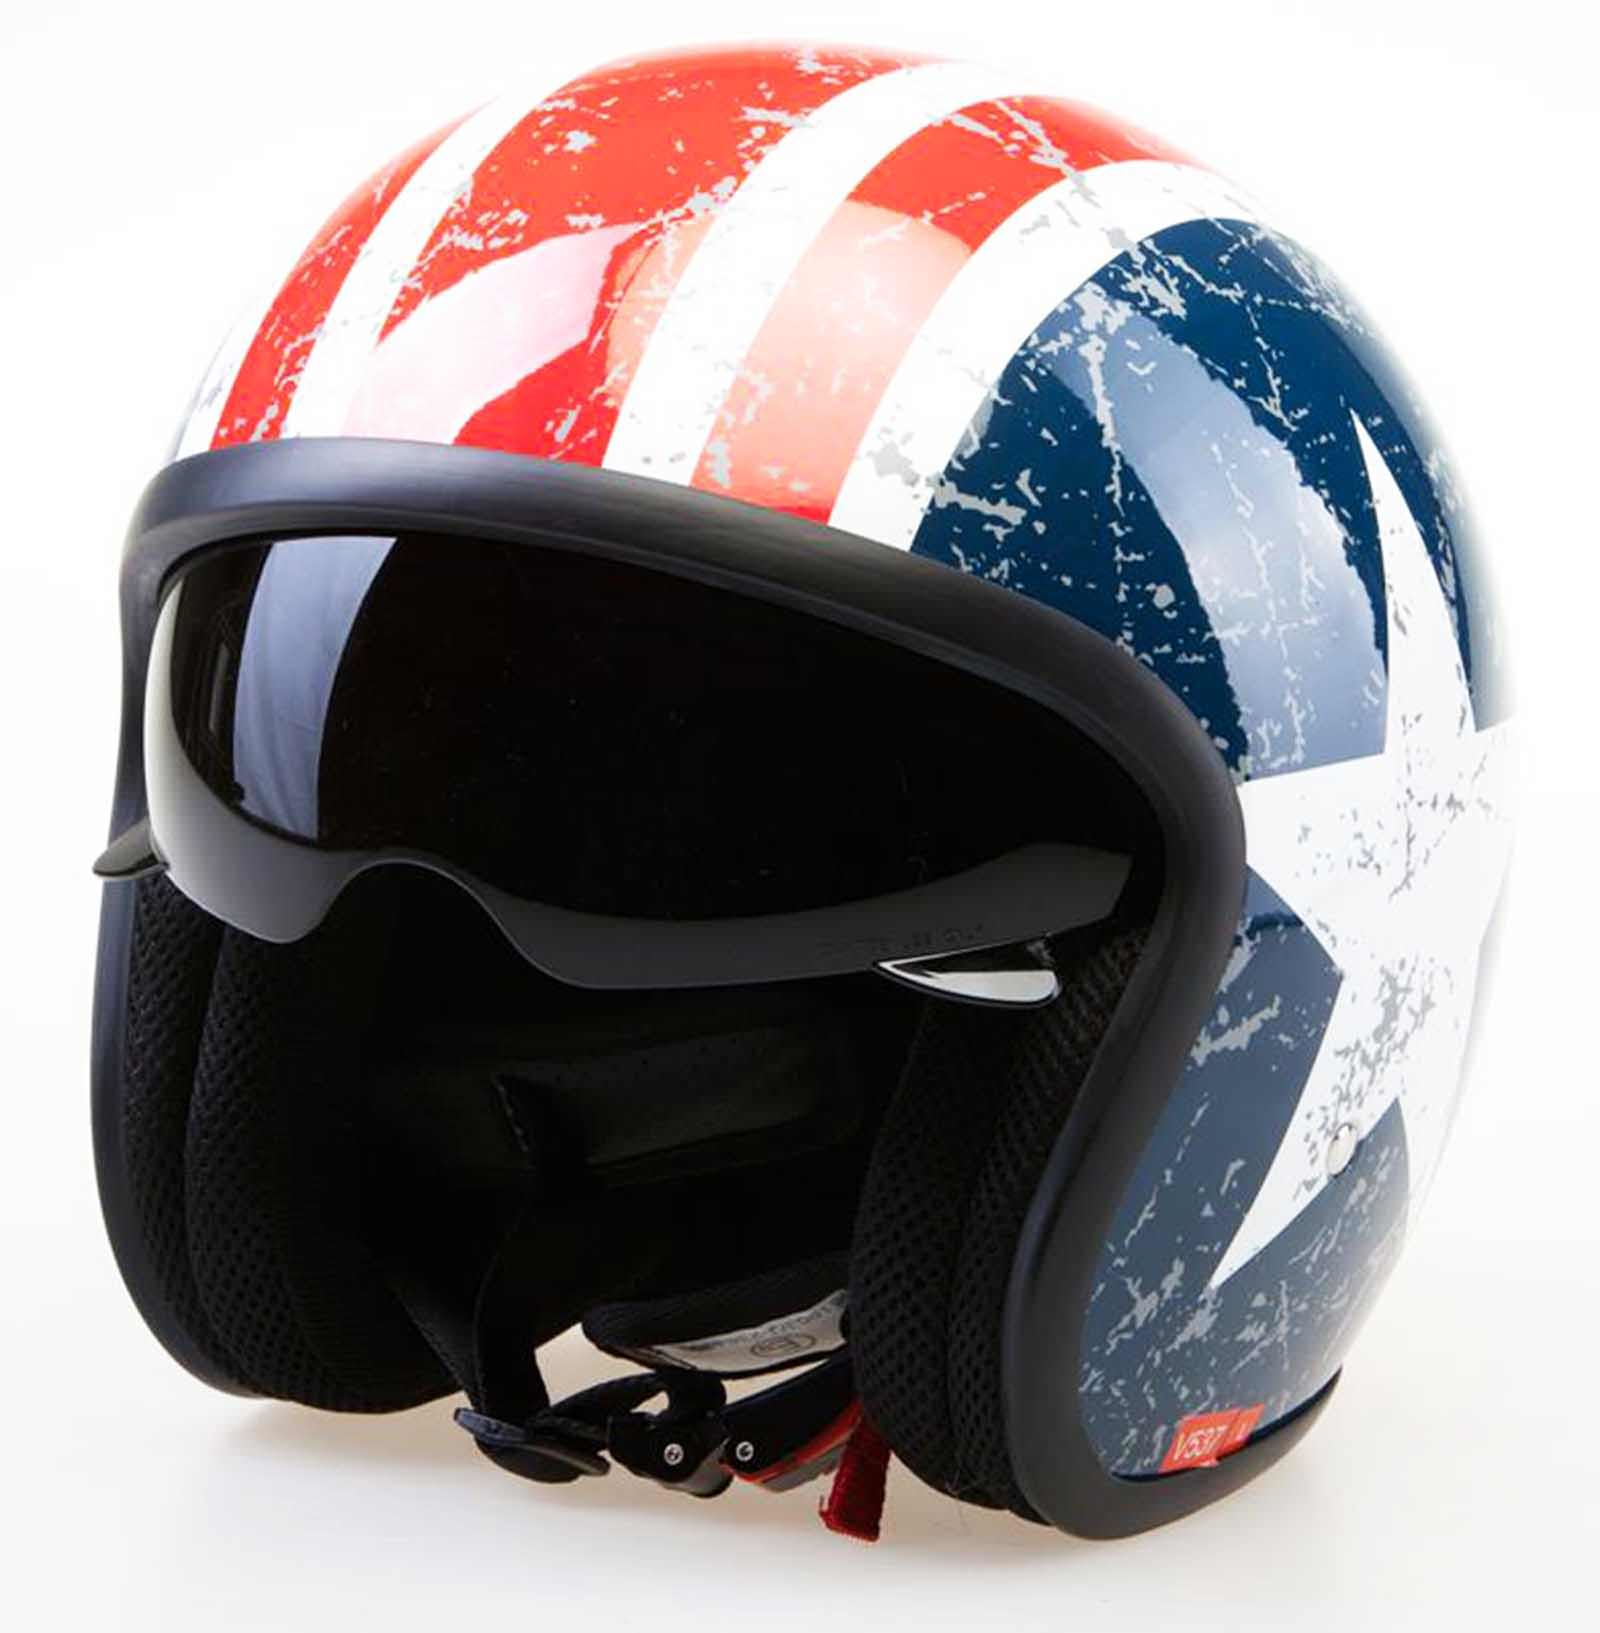 Viper-RSV06-Motorbike-Motorcycle-Open-Face-Jet-Touring-Helmet-Seatbelt-Fastener